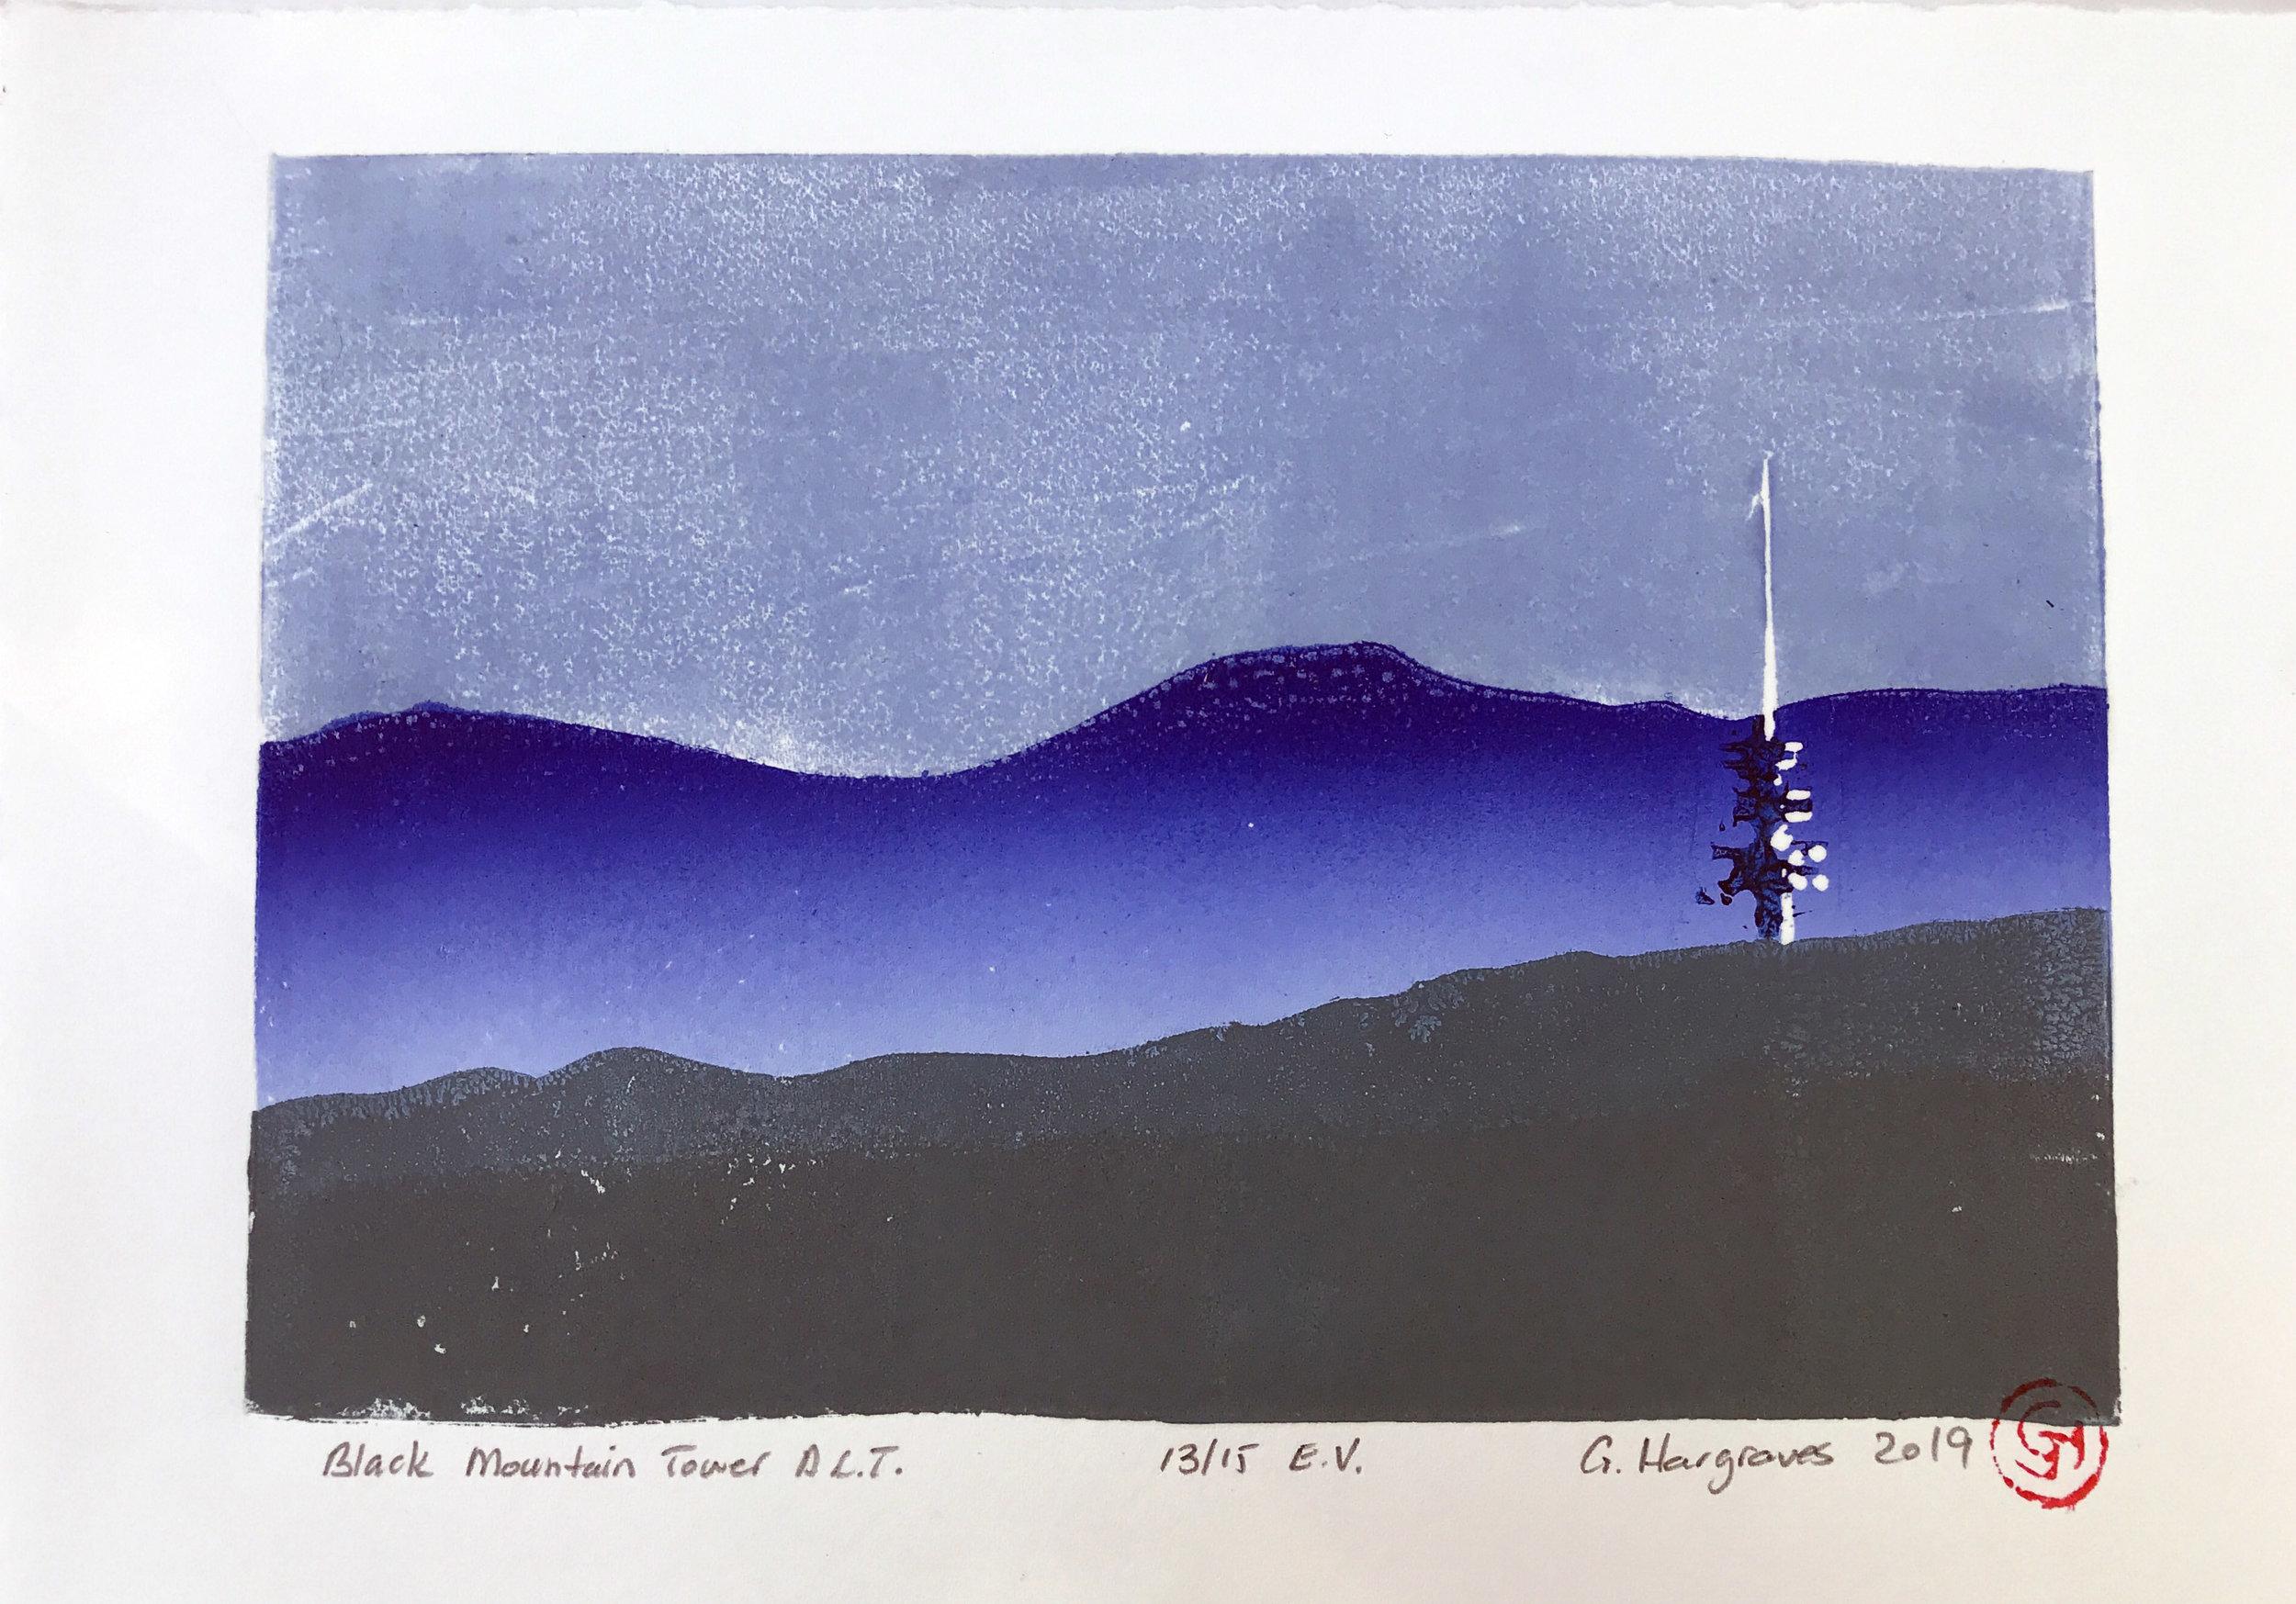 Black mountain tower ACT